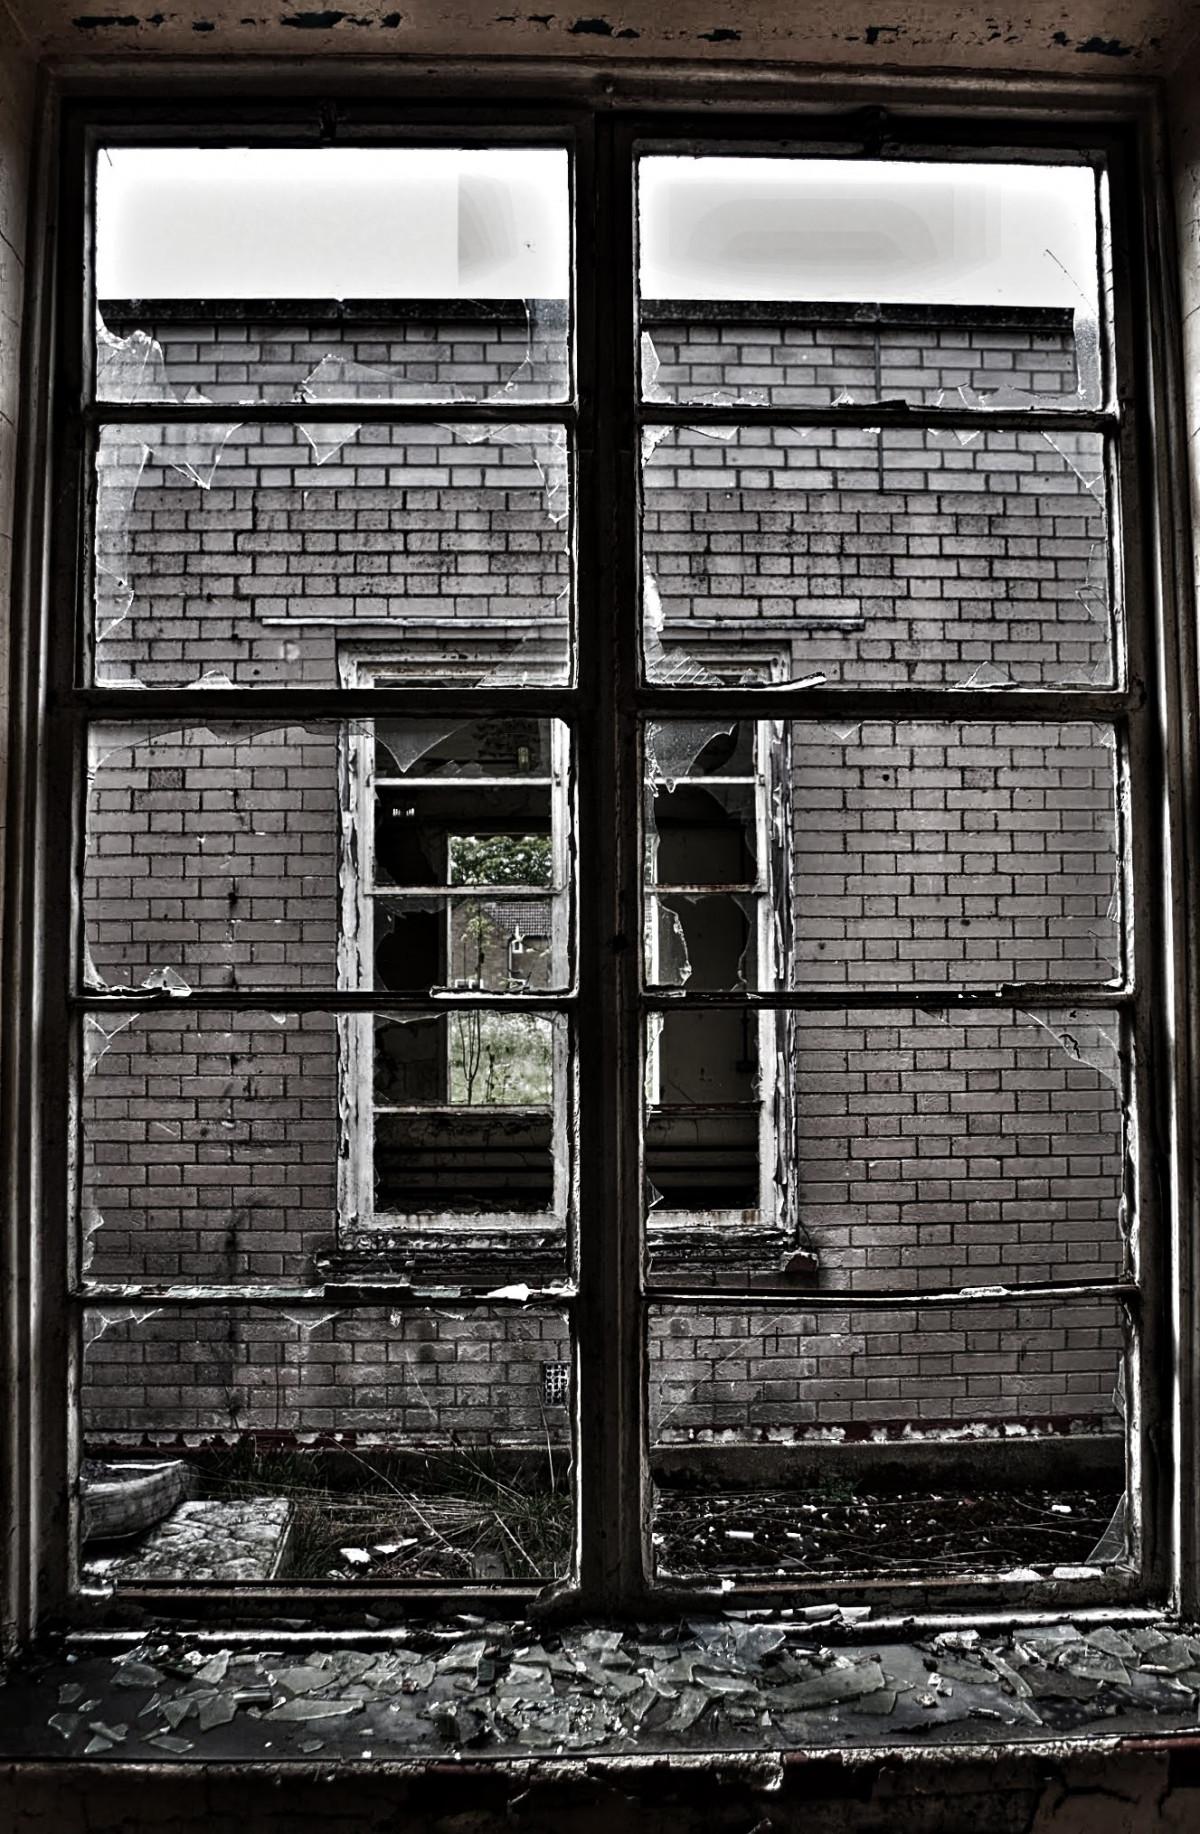 Broken Glass Window : Free images house hole window glass old barn wall